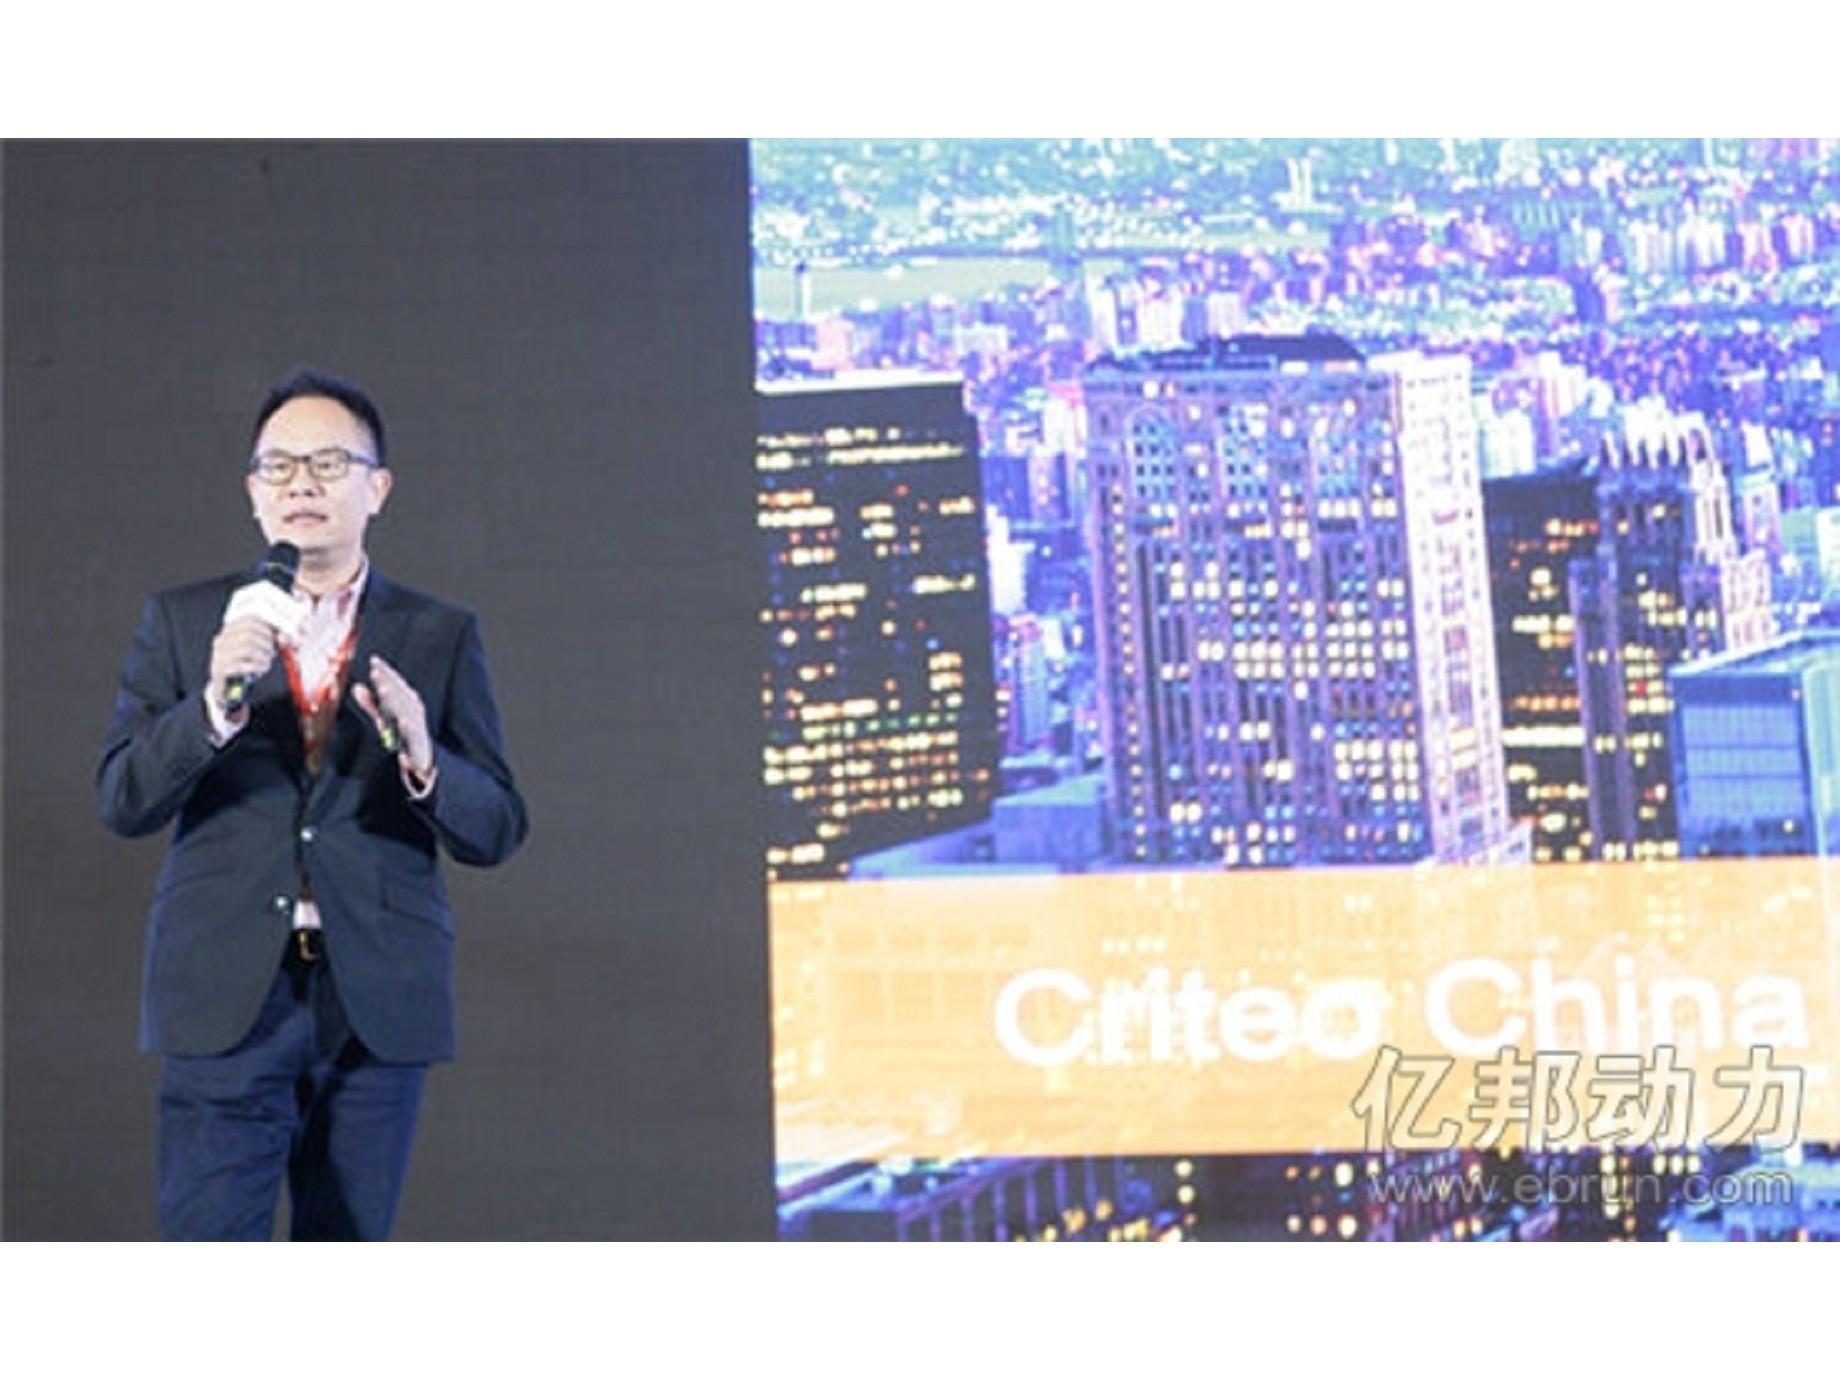 Criteo中國區總裁鄭家強: 做電商不知道這些營銷技巧你就OUT了